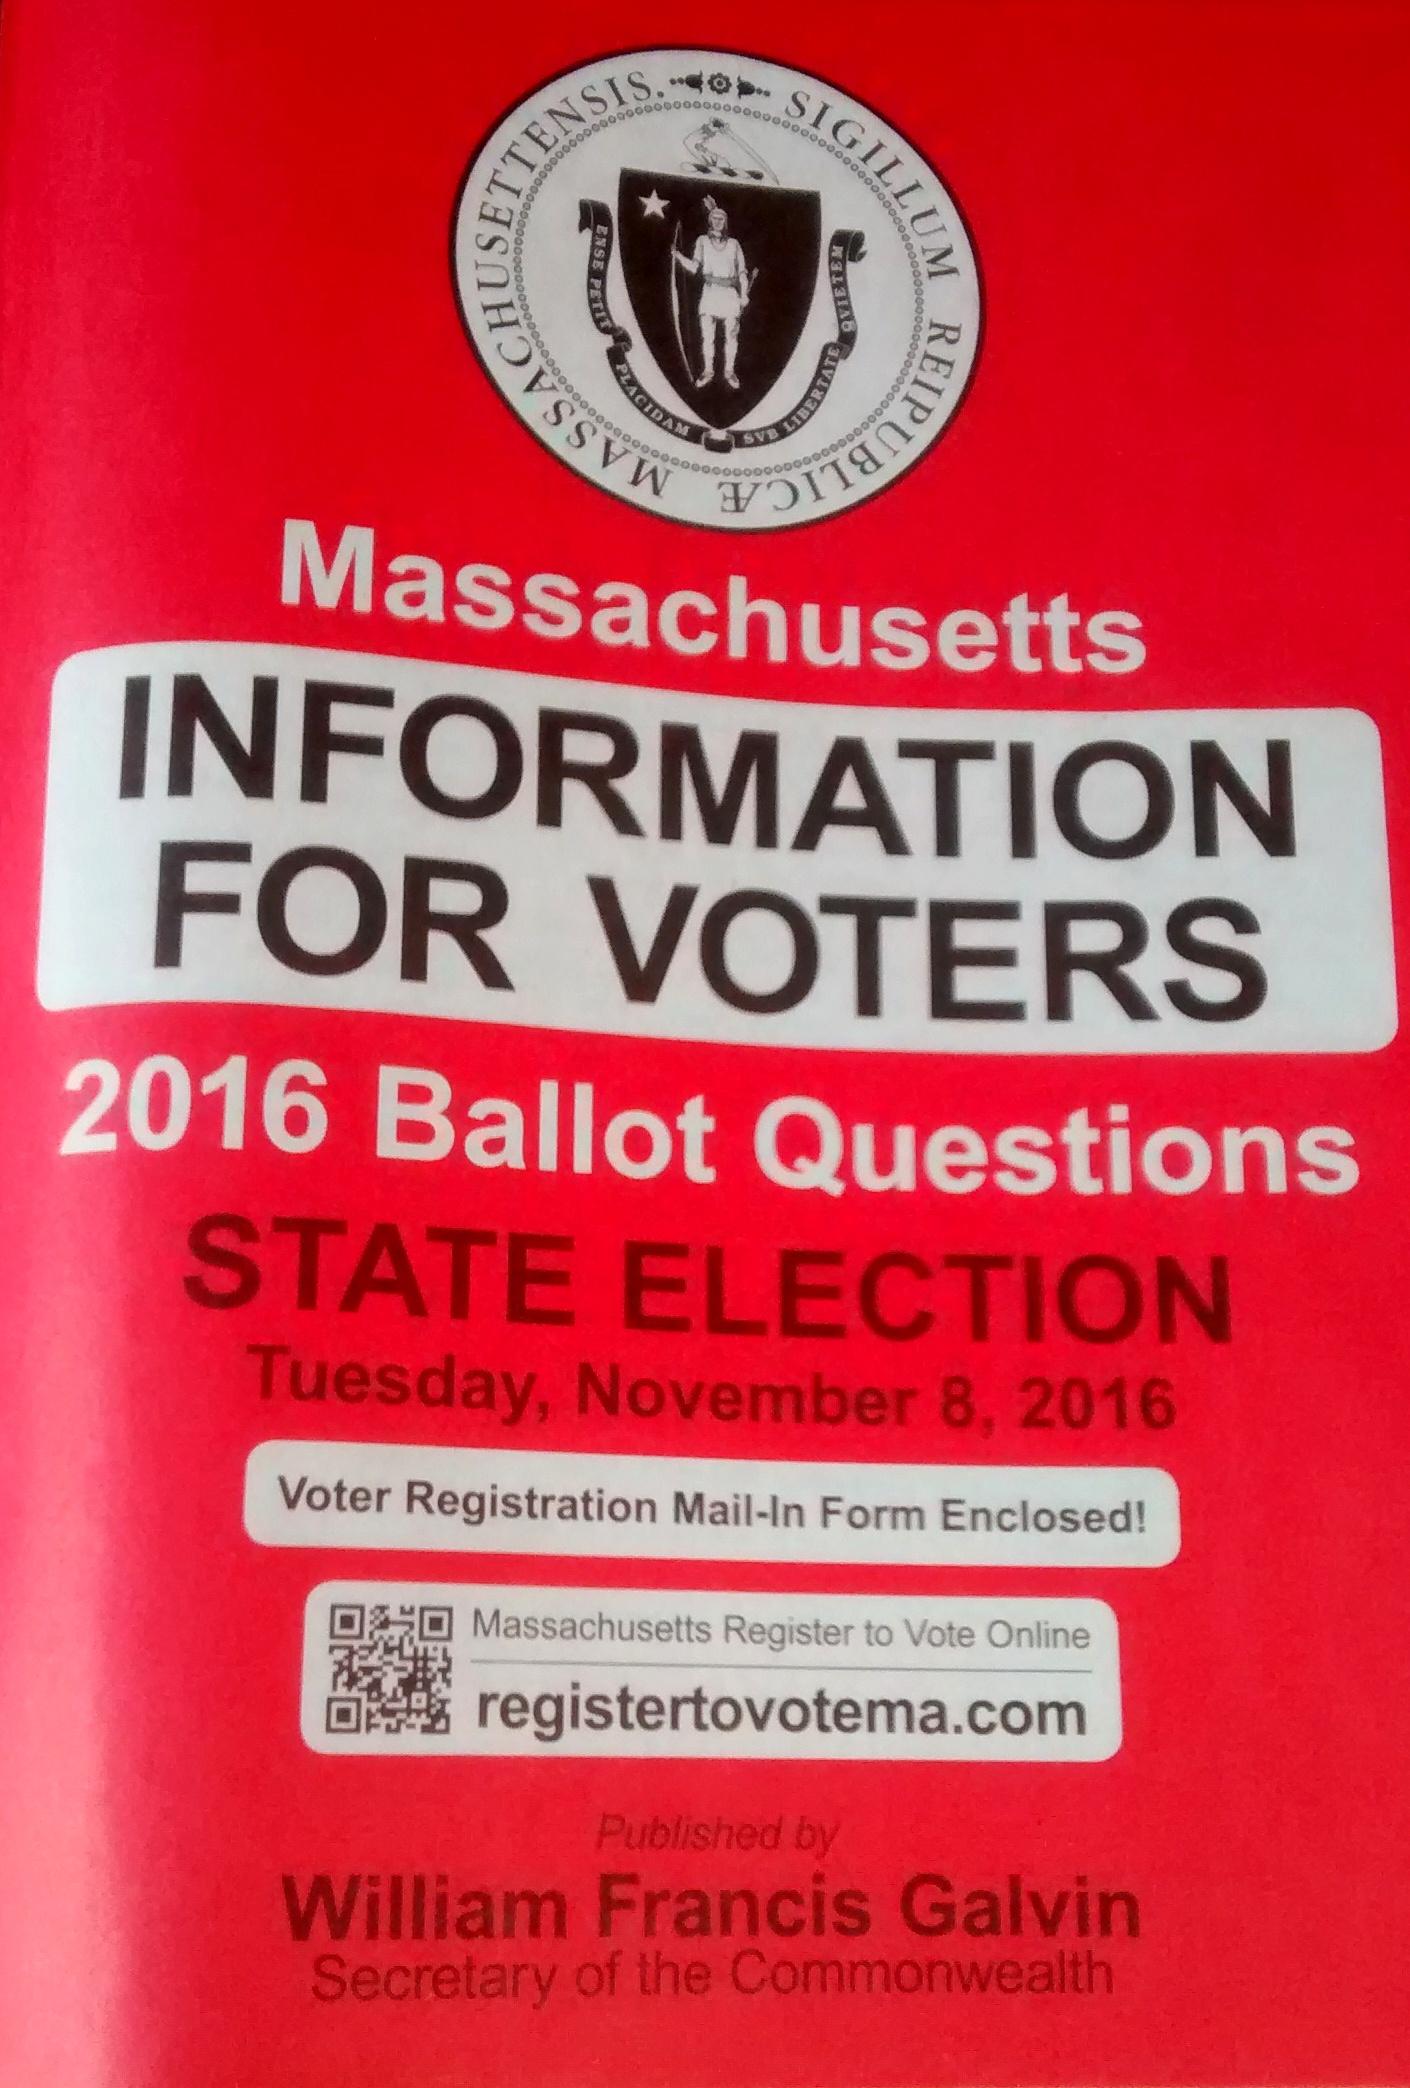 ballot-questions